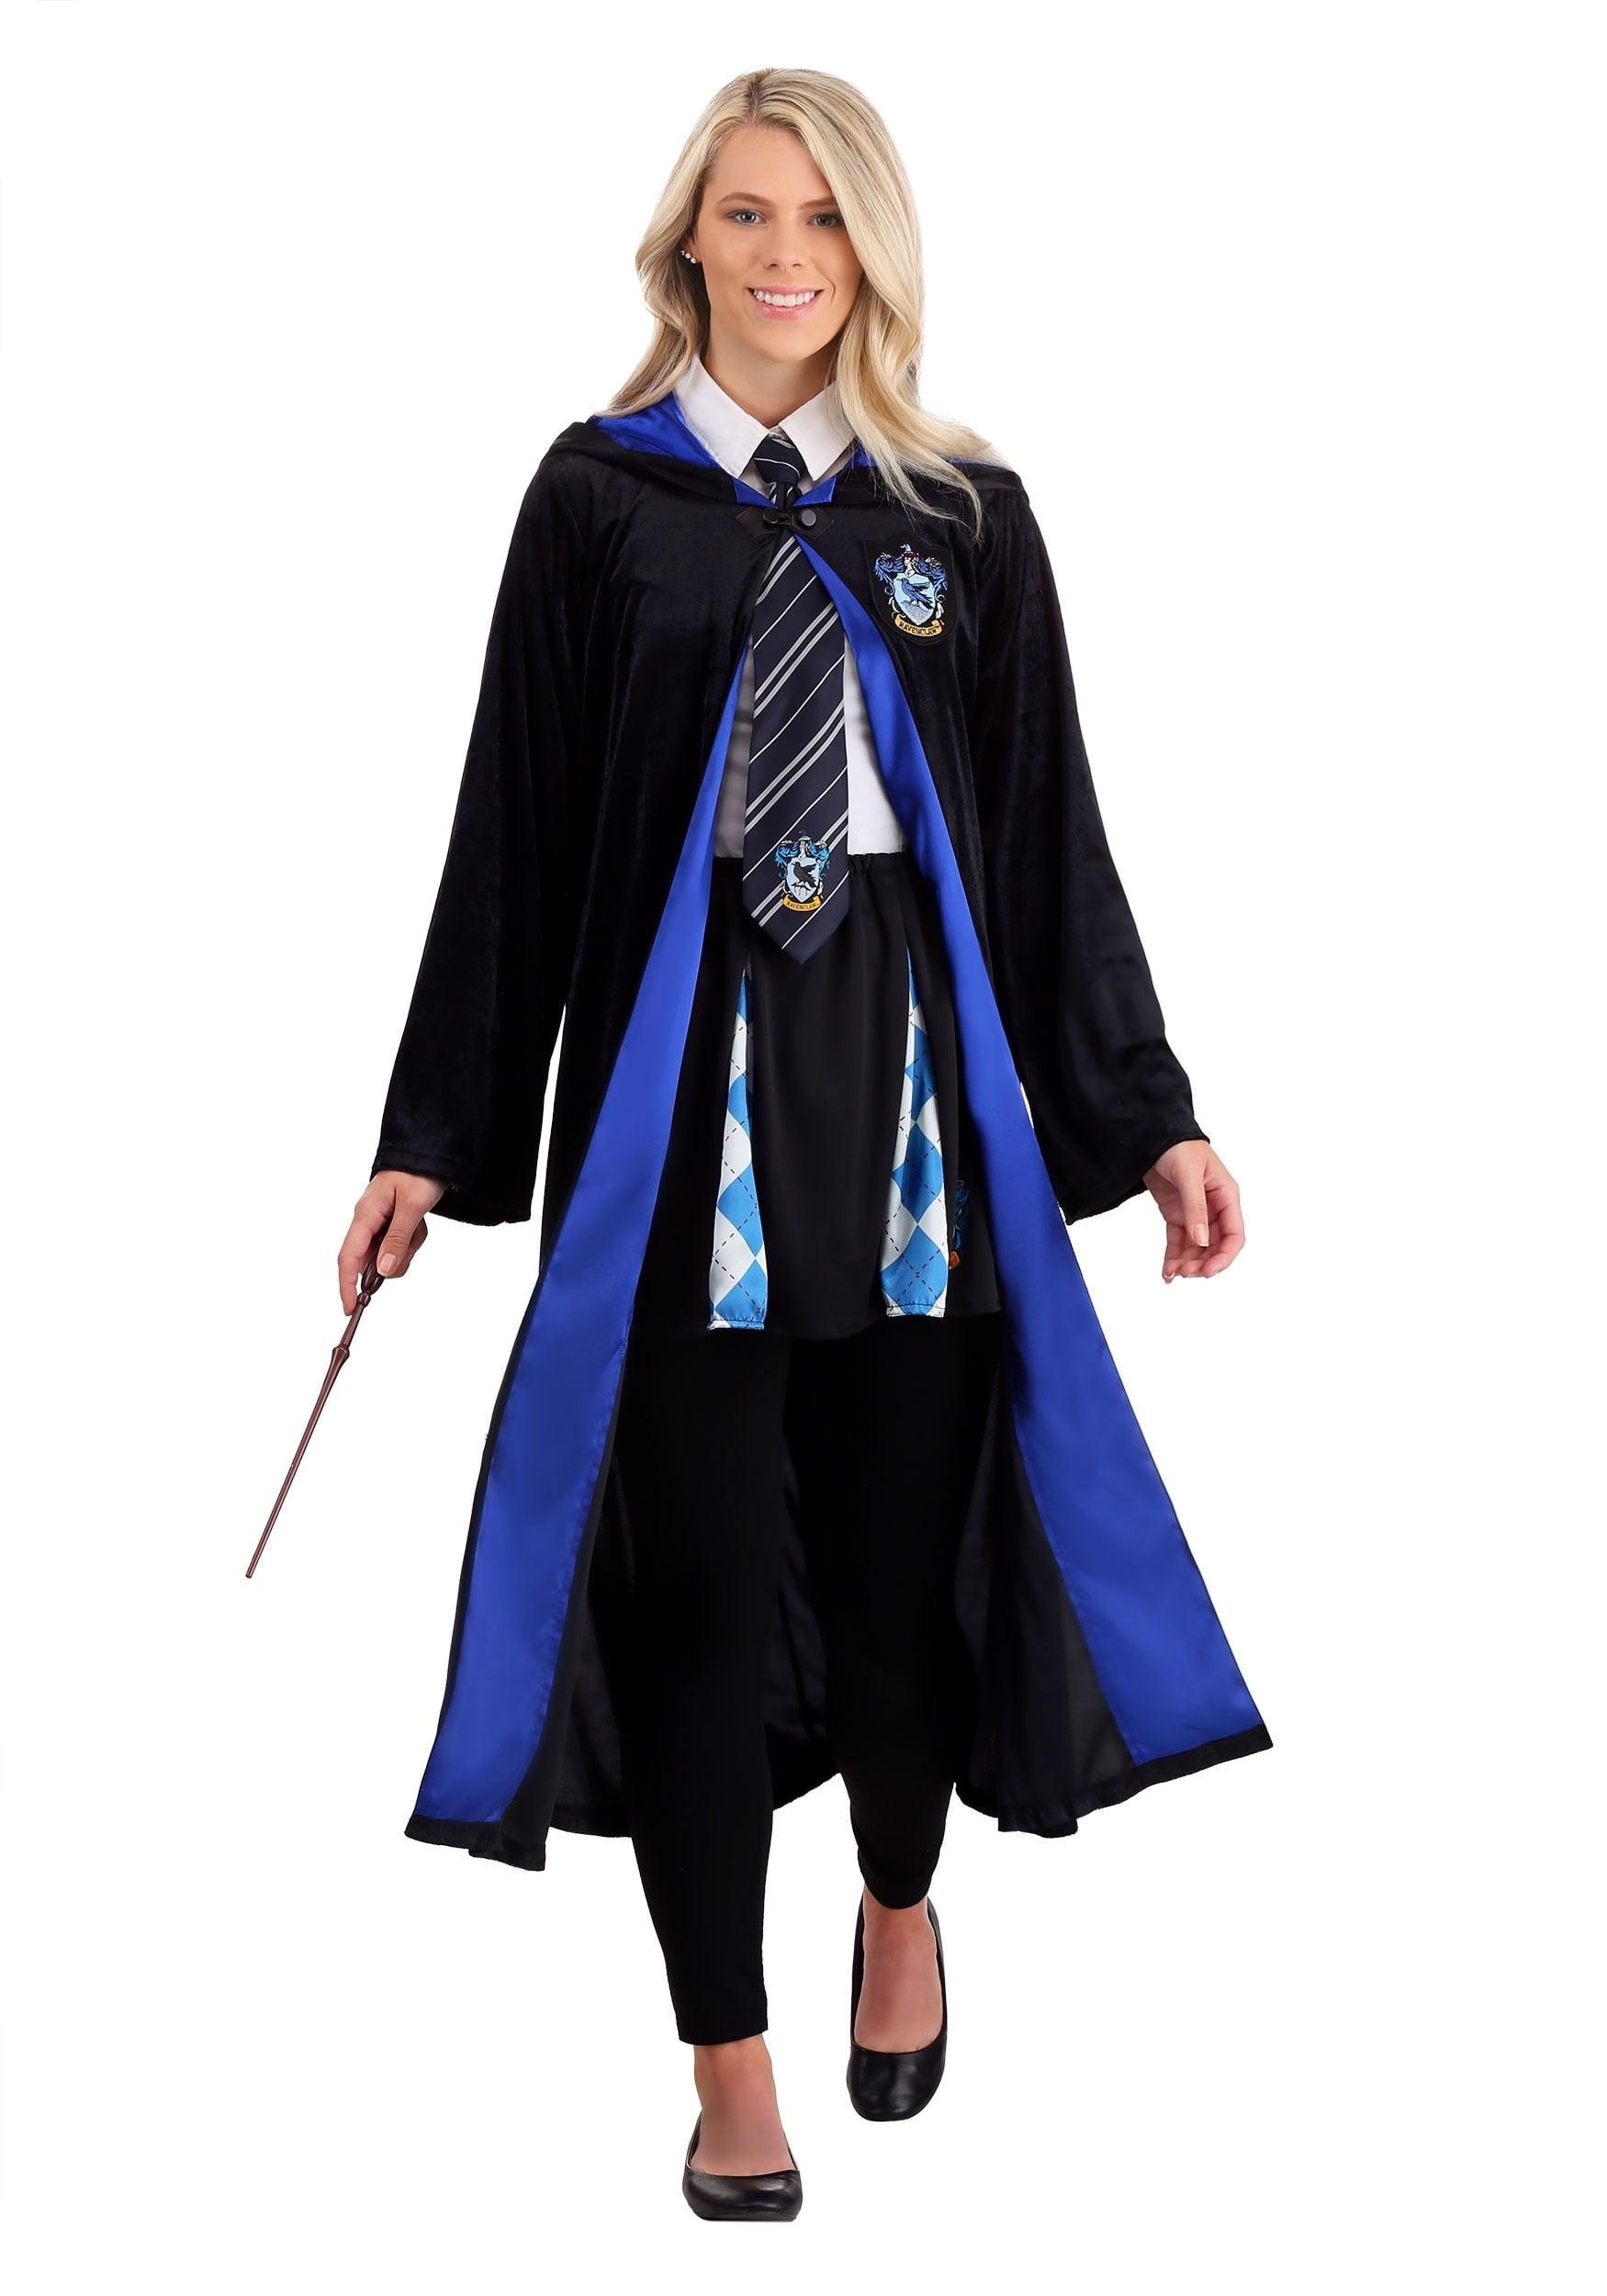 Details about  /Hufflepuff School Uniform Cosplay Costume Robe Cloak Halloween Suit